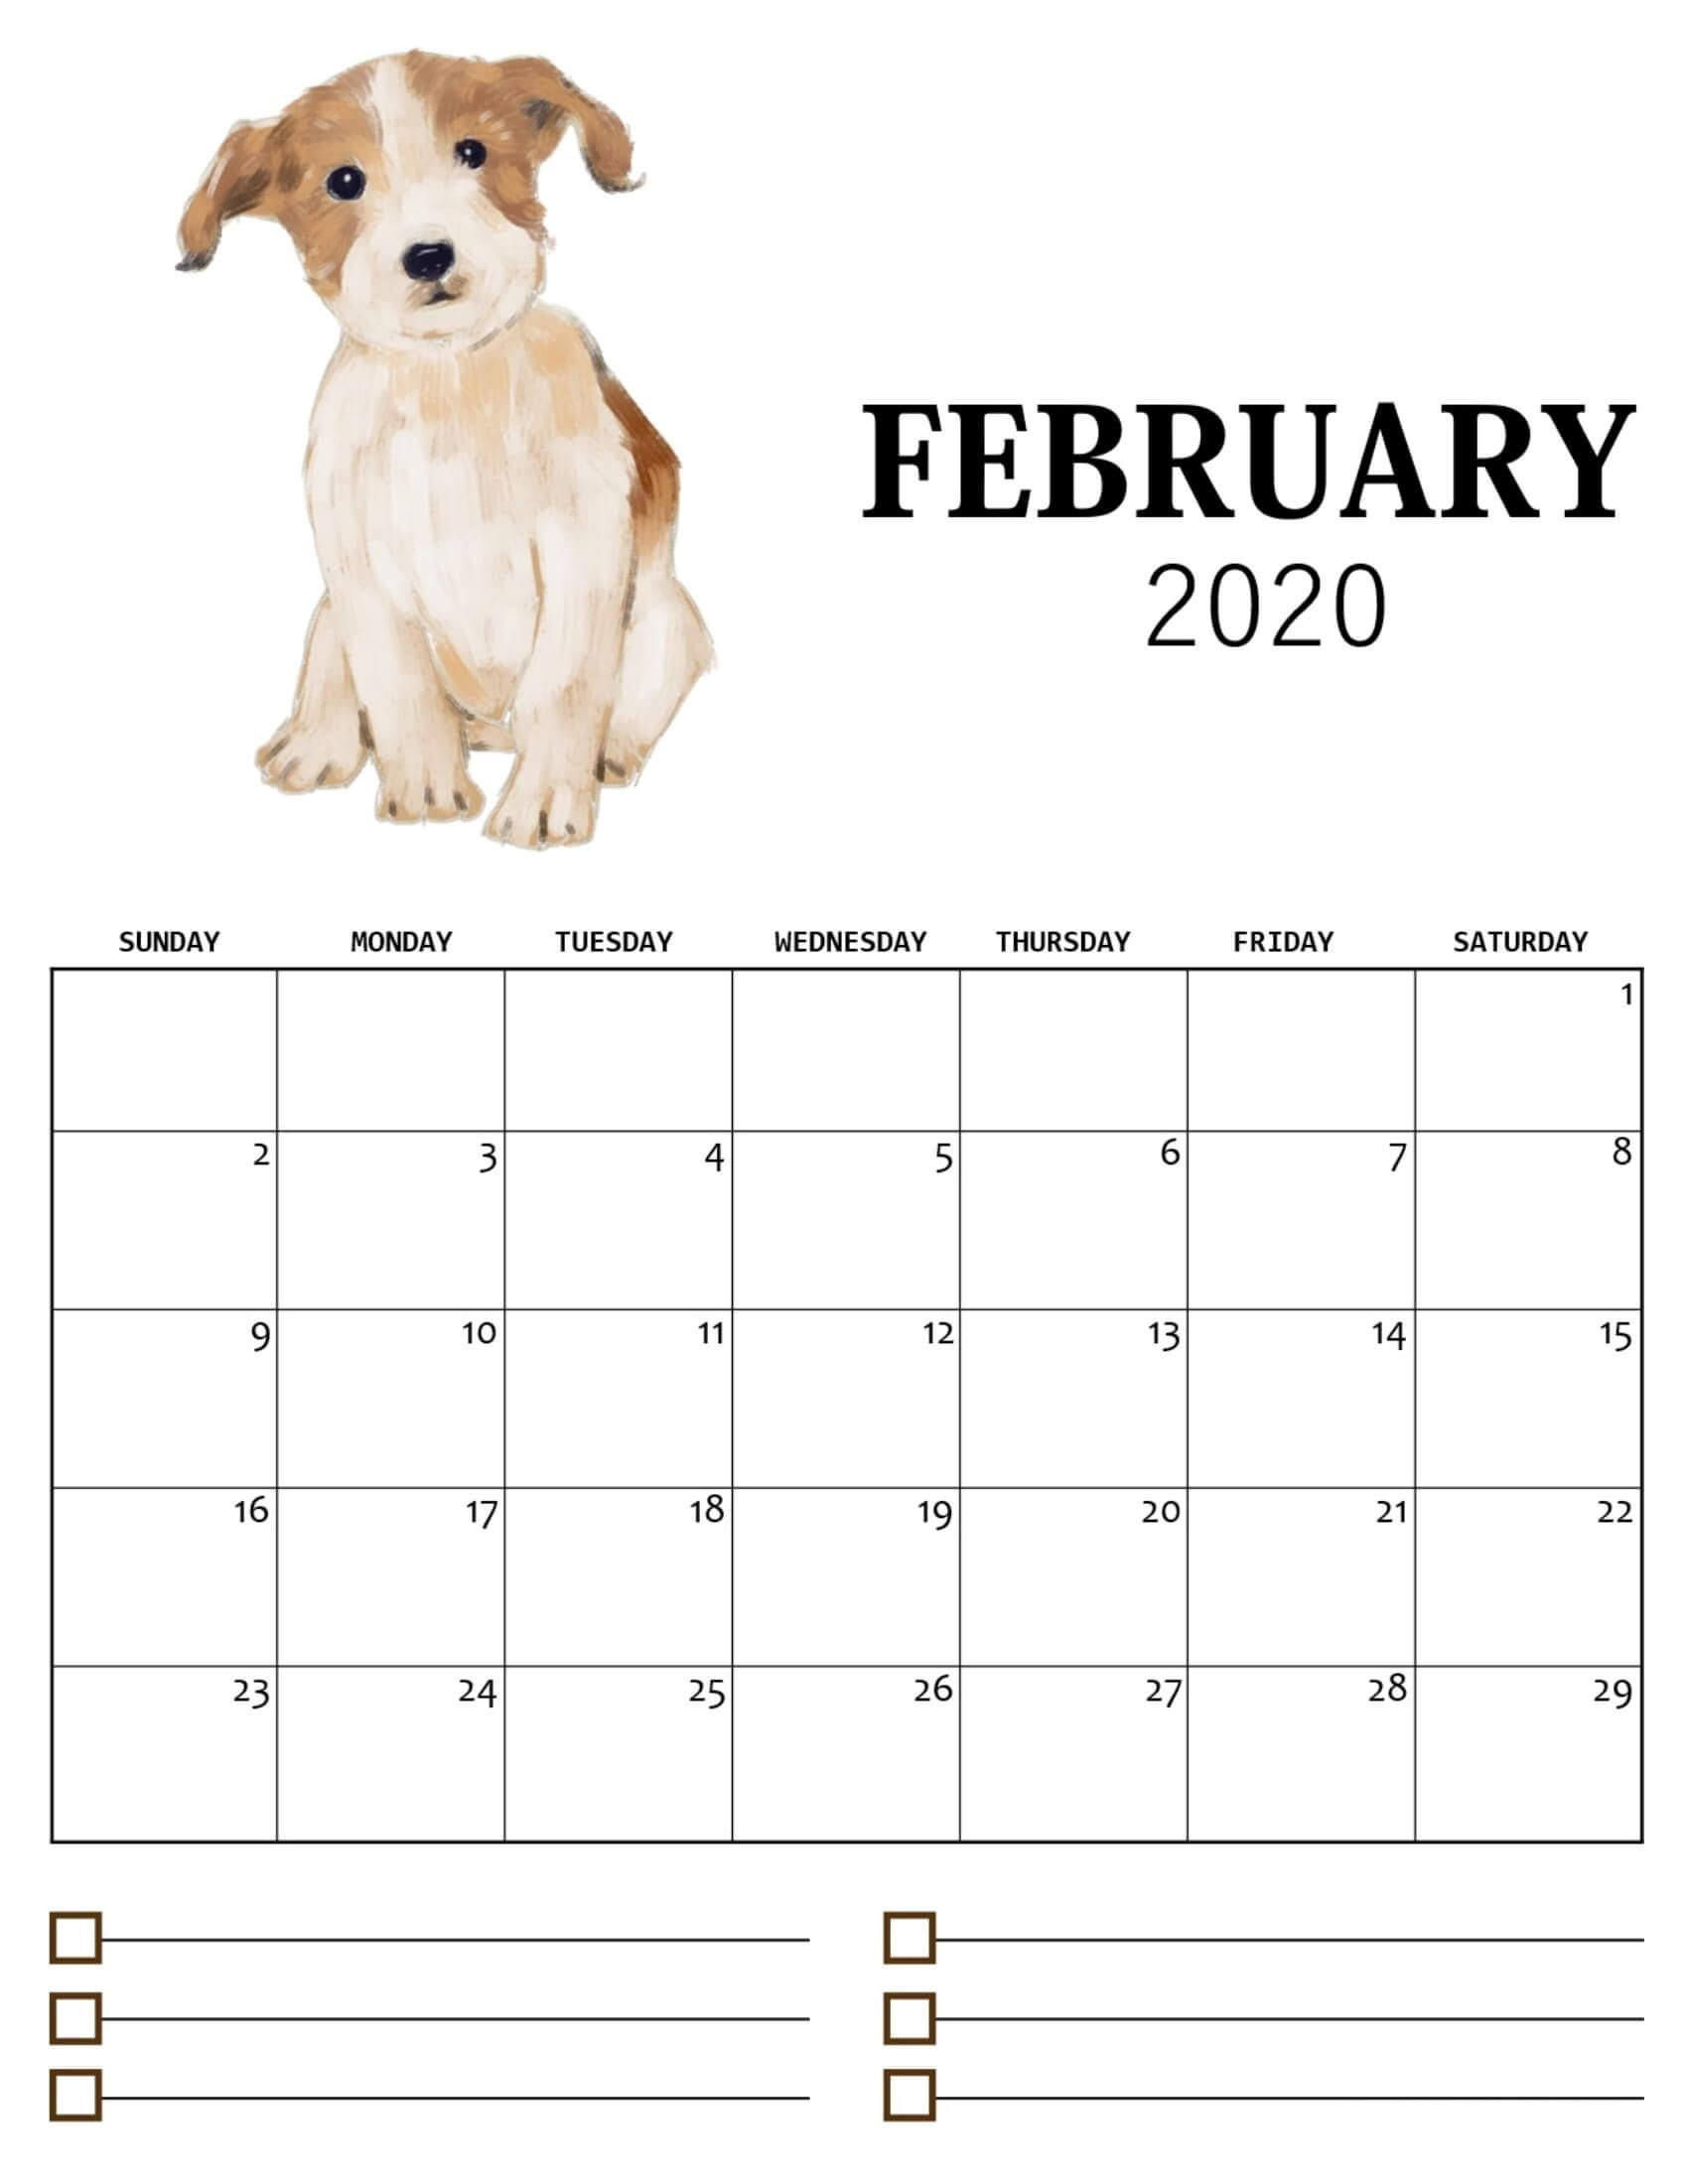 Cute February 2020 Calendar For Kids